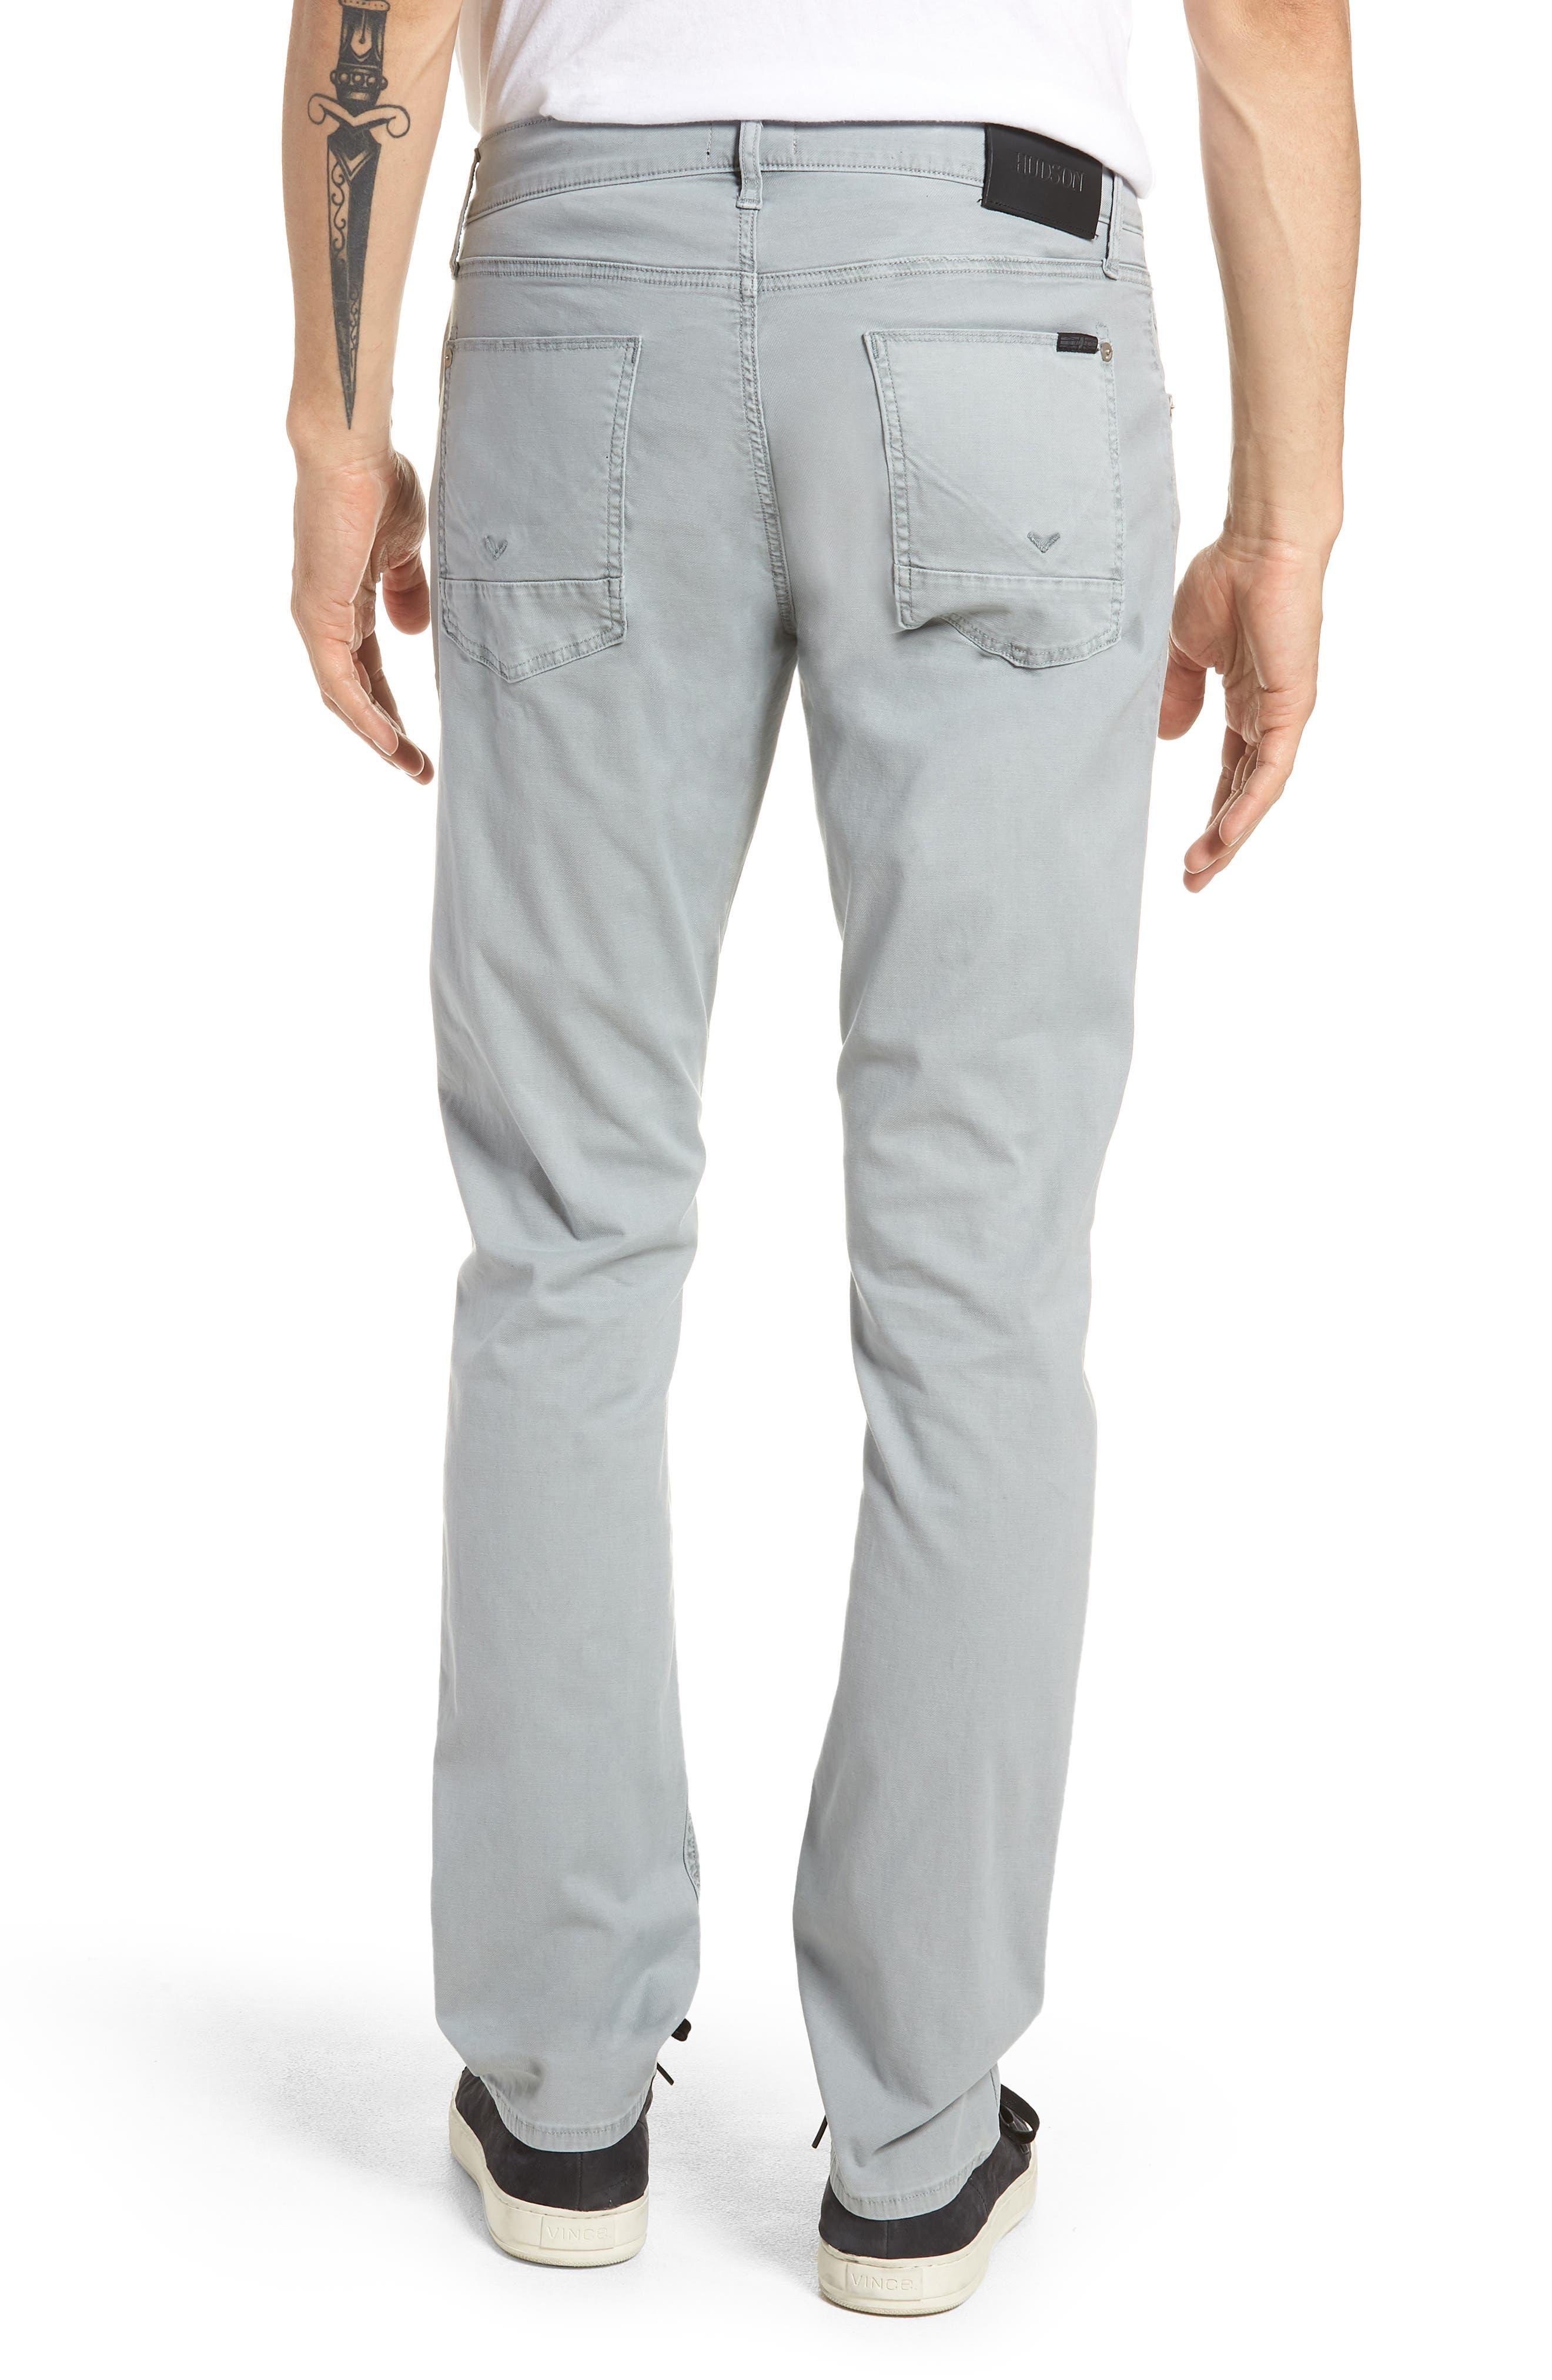 HUDSON JEANS,                             Blake Slim Fit Jeans,                             Alternate thumbnail 2, color,                             400